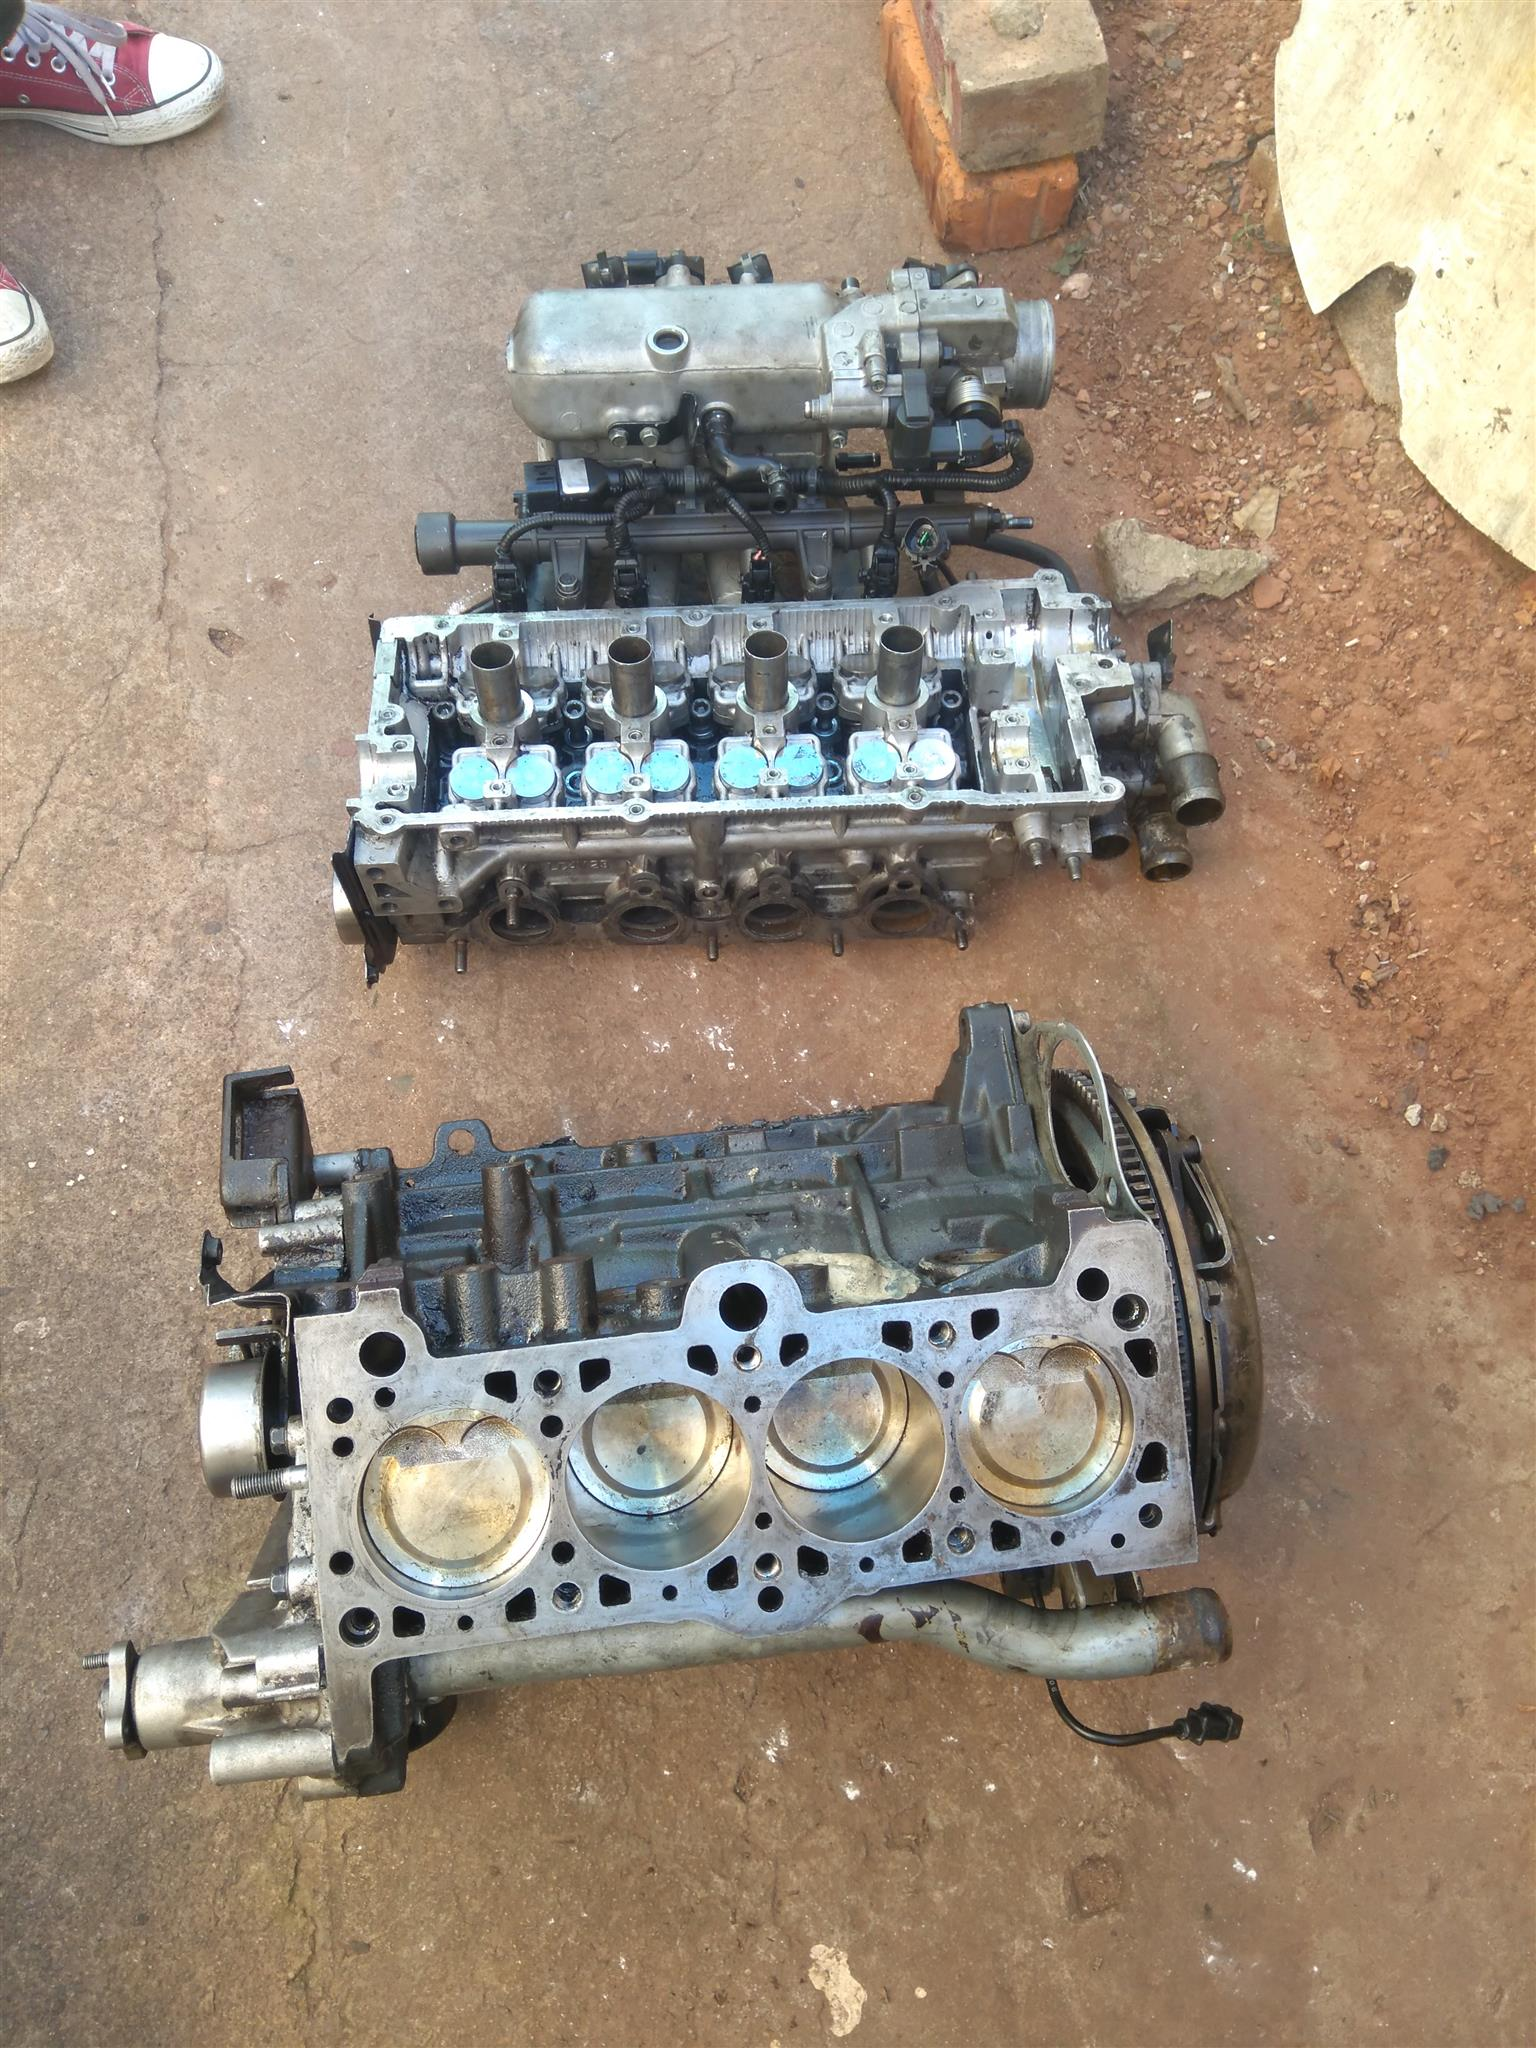 Hyundai getz 1.4 16 valves